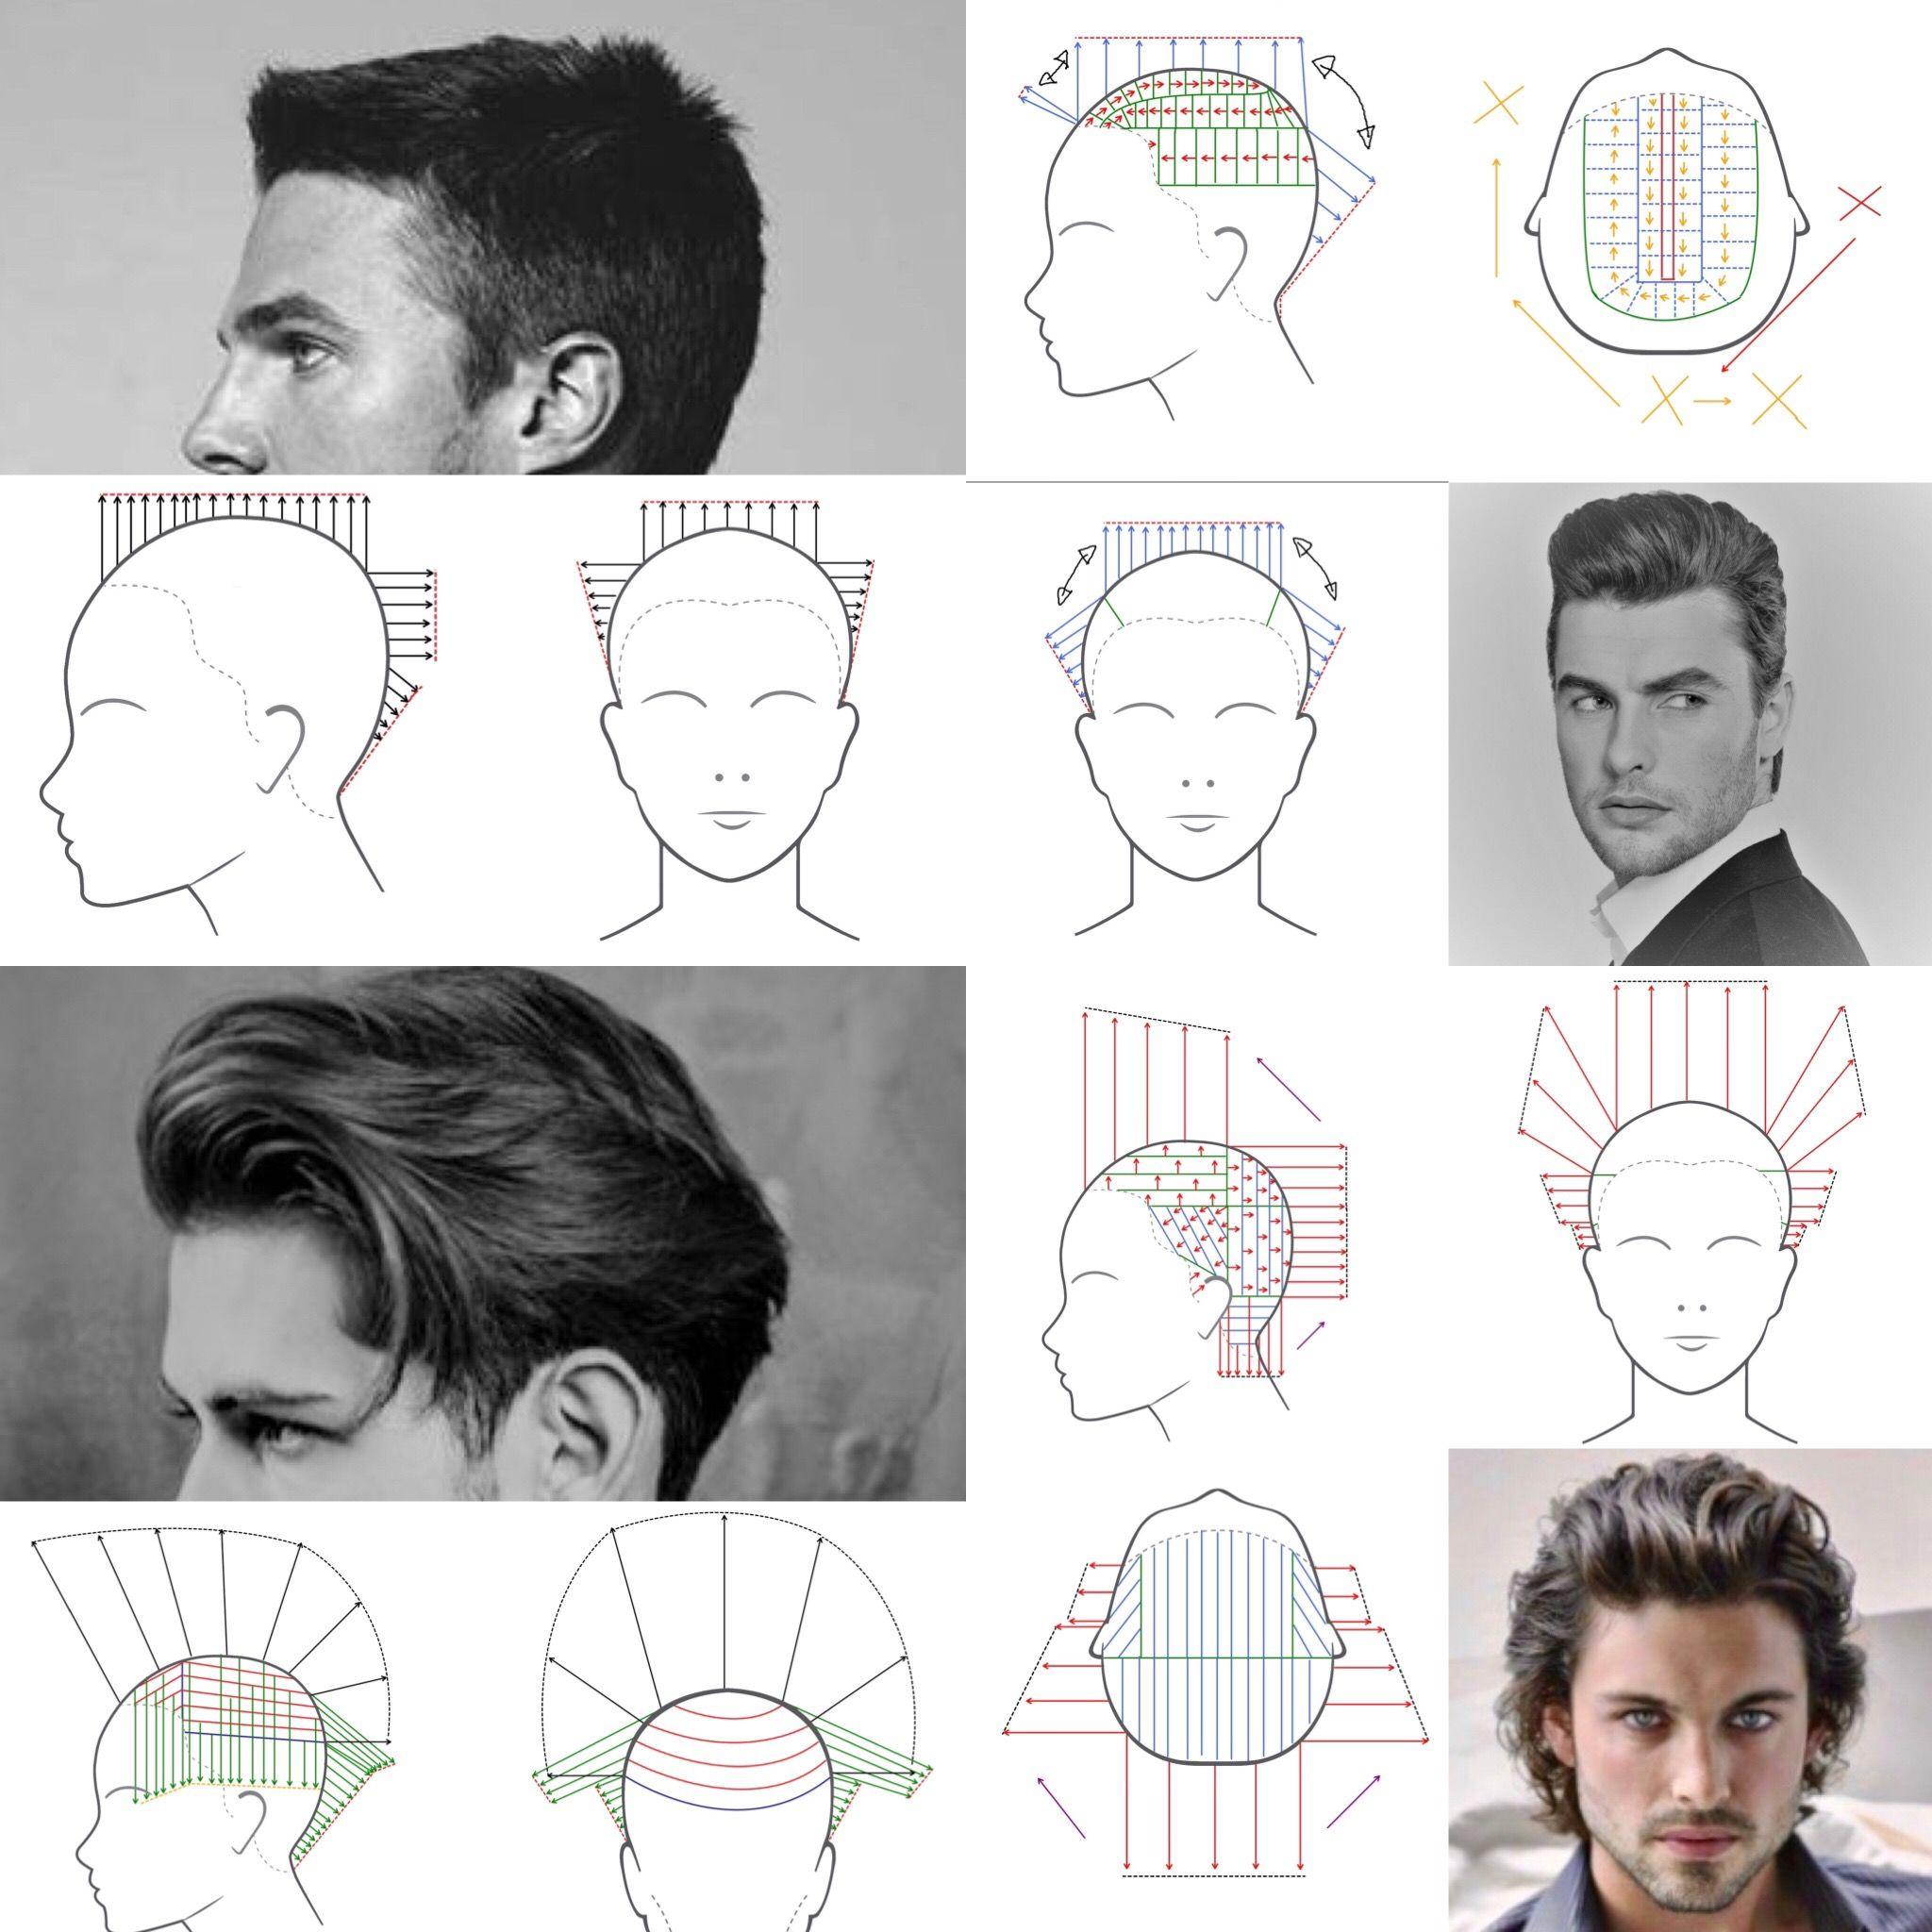 Shapeme Real Men Haircuts Haare Schneiden Anleitung Haare Schneiden Manner Honigblonde Haarfarbe